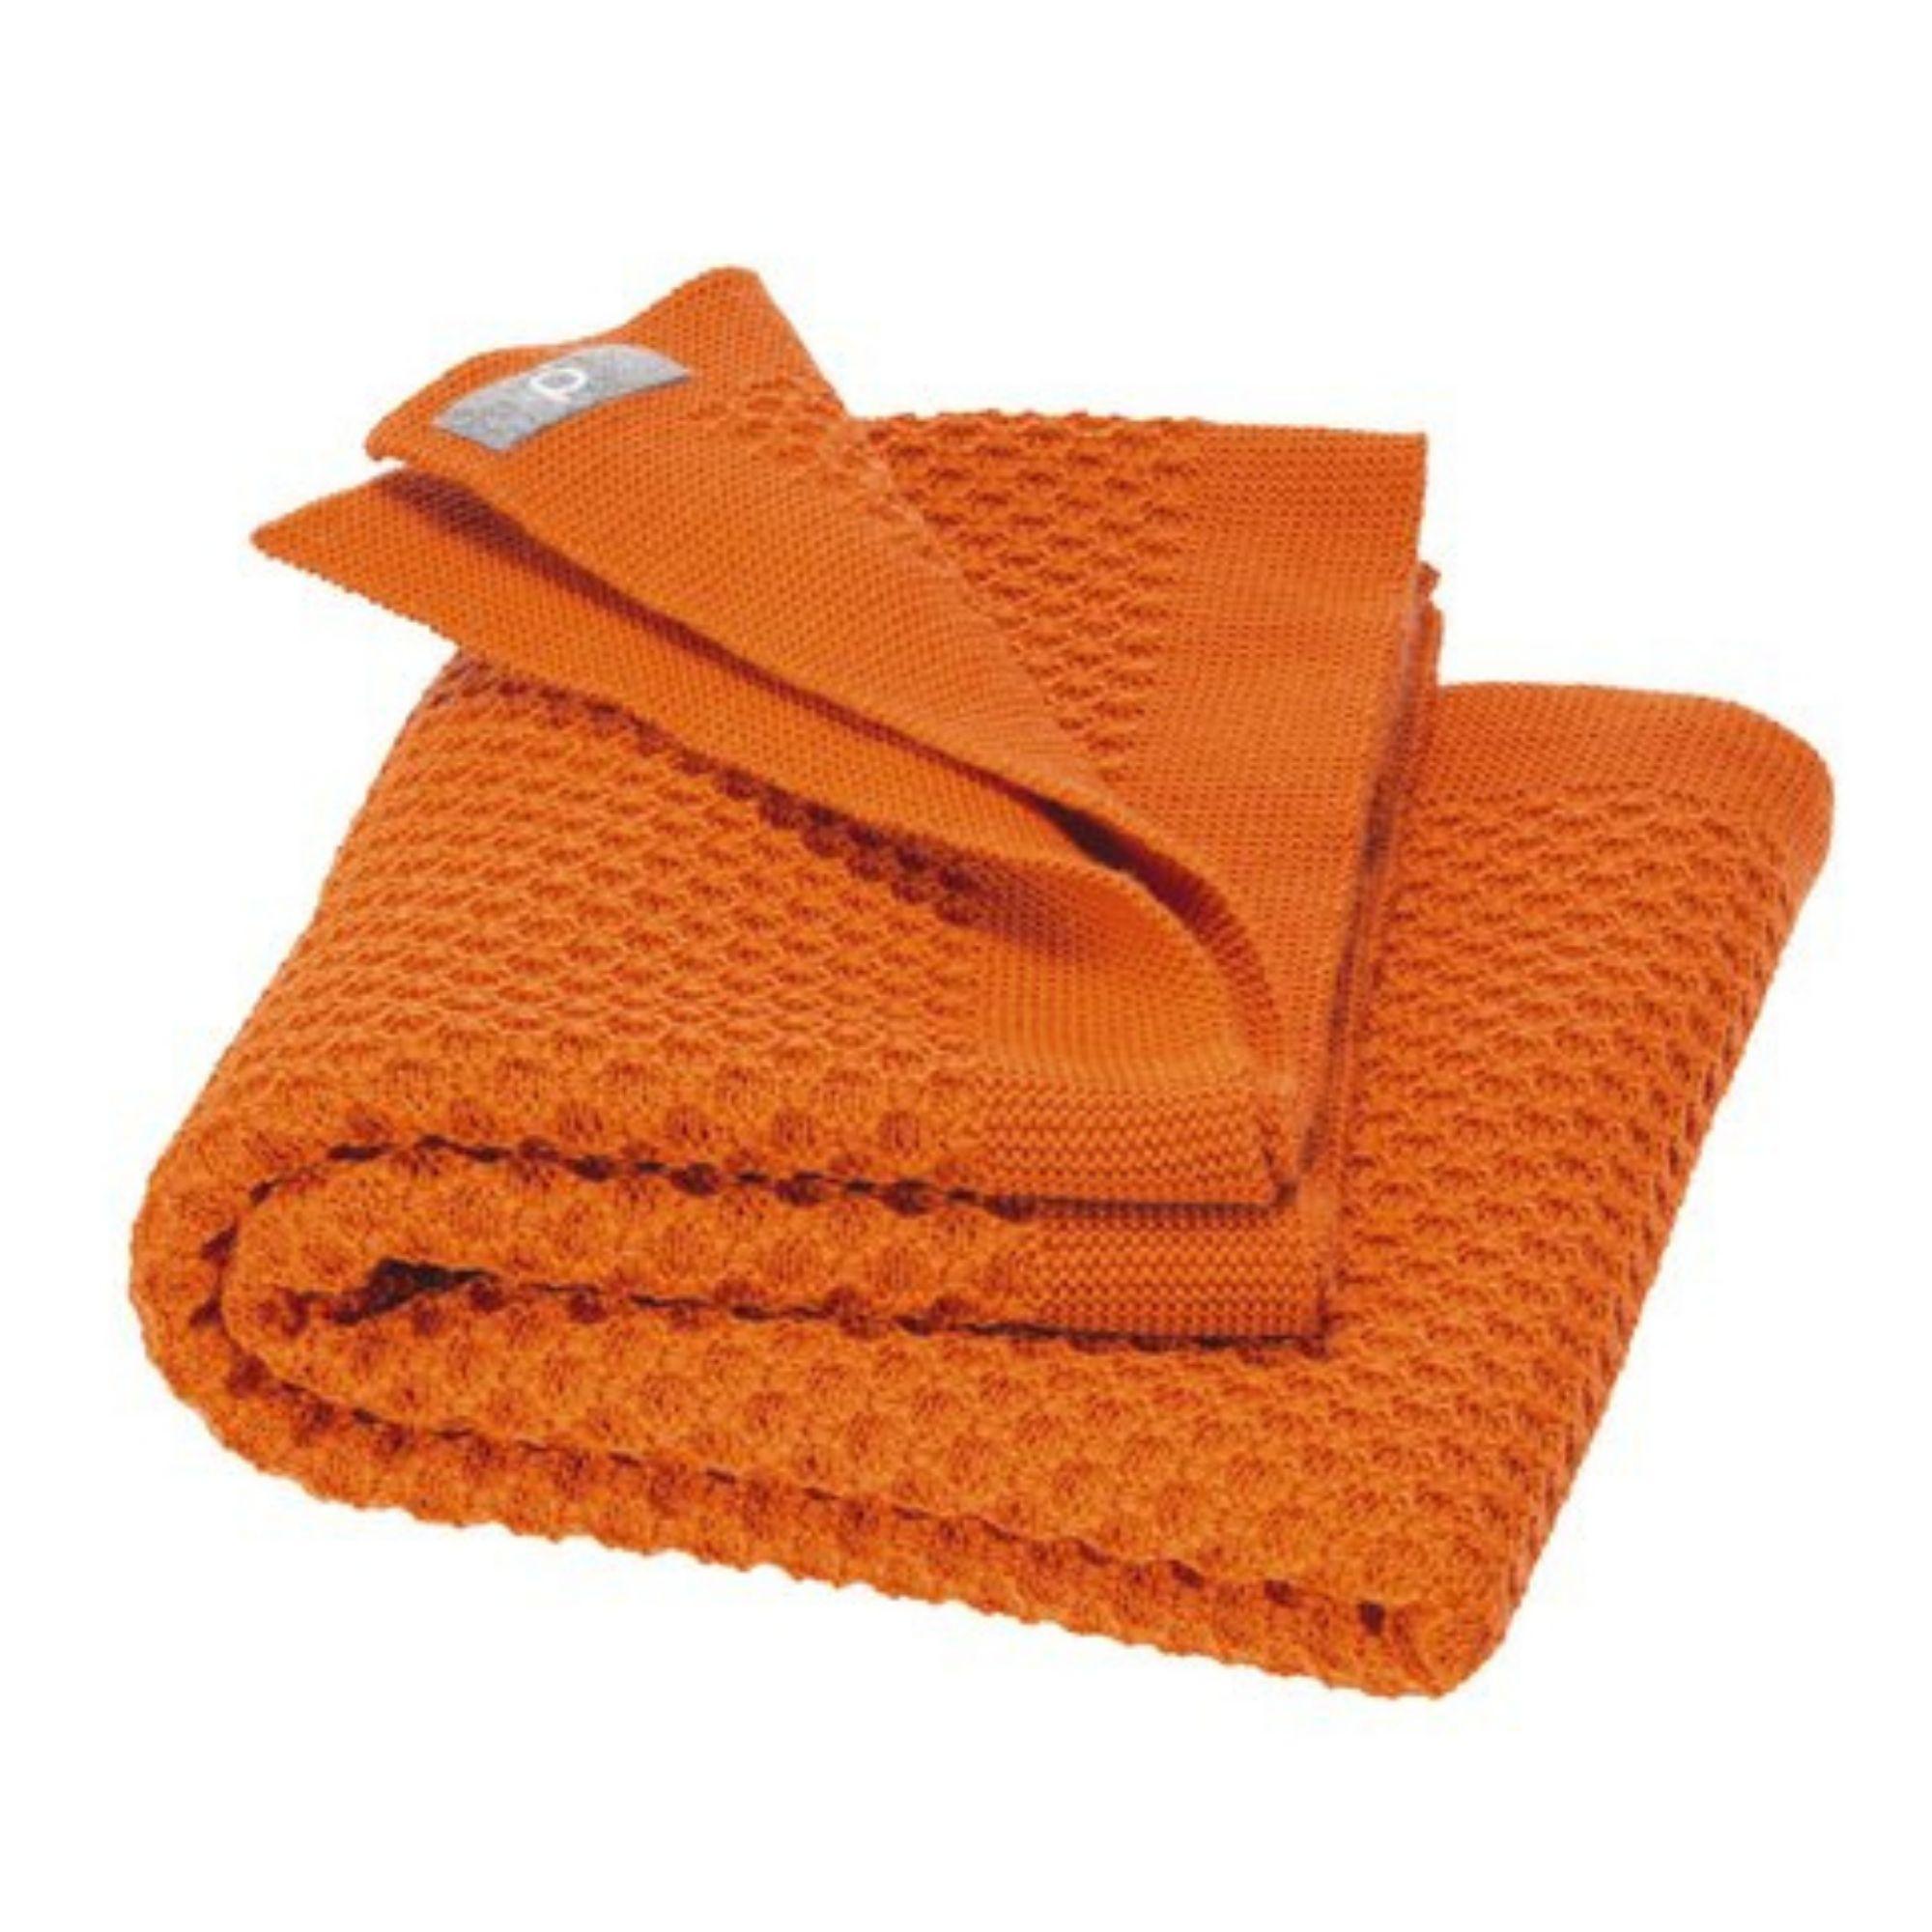 couverture-bebe-enfant-pure-laine-merinos-bio-tricotee-disana-maison-de-mamoulia-honeycomb-nid-abeille-orange